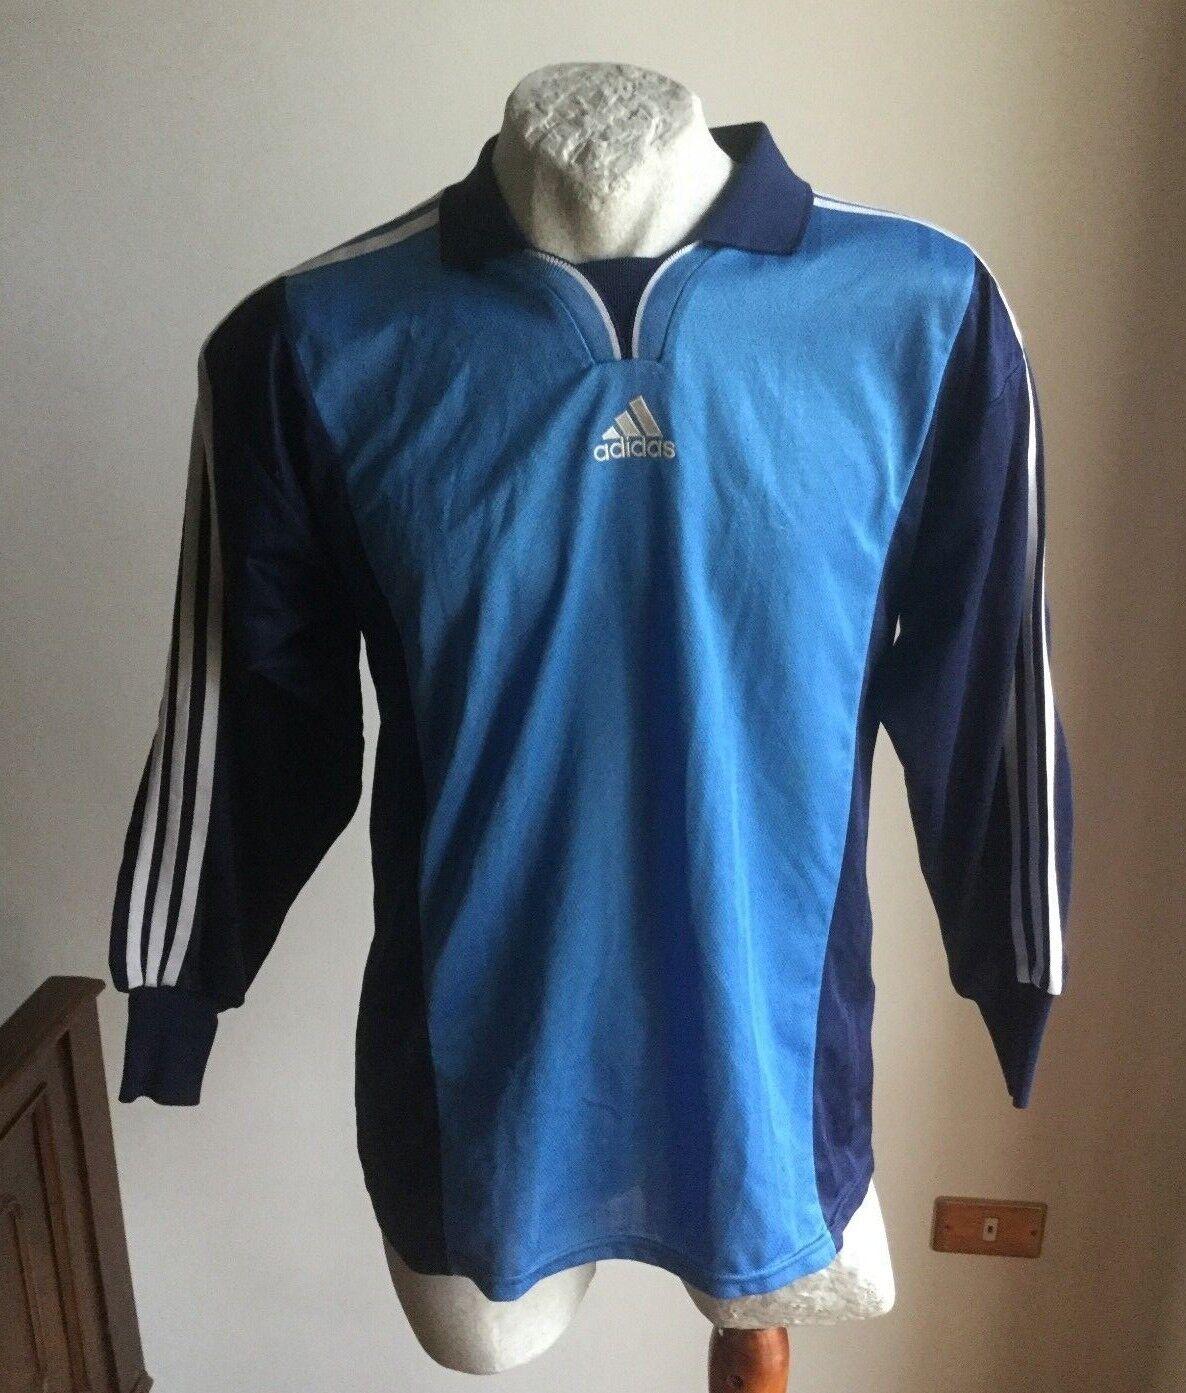 Maglia calcio adidas portiere football shirt goalkeeper trikot maillot size m